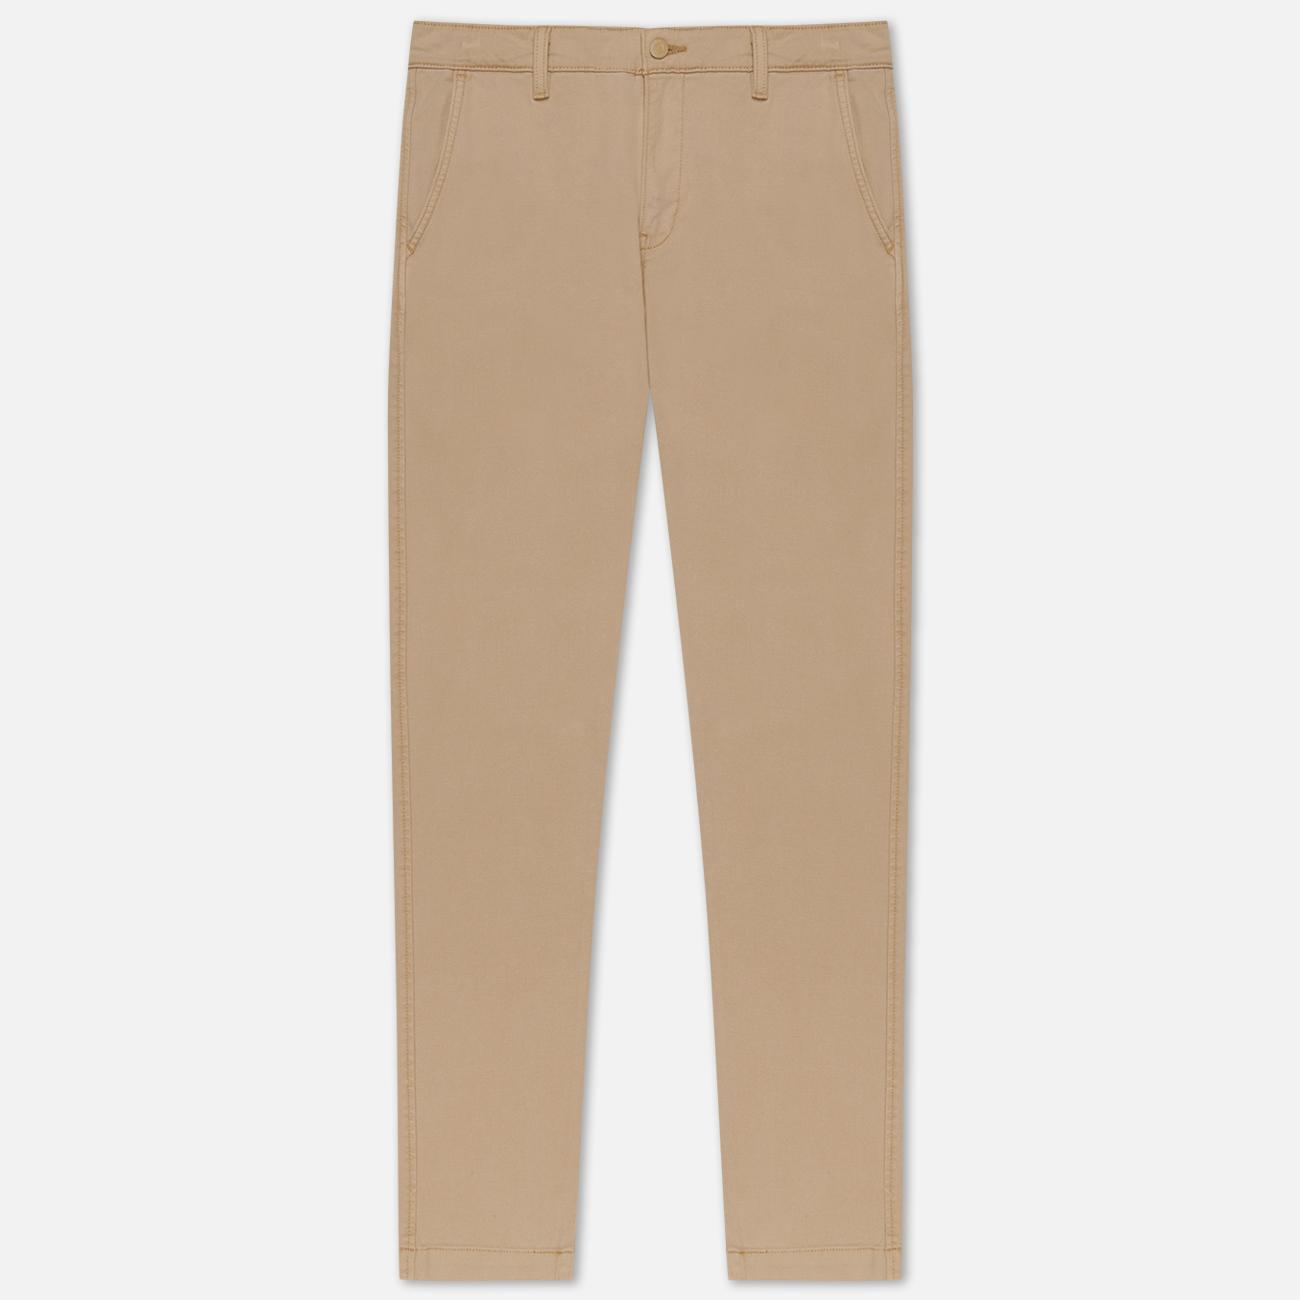 Мужские брюки Levi's XX Chino Slim II True Chino Shady Neutral